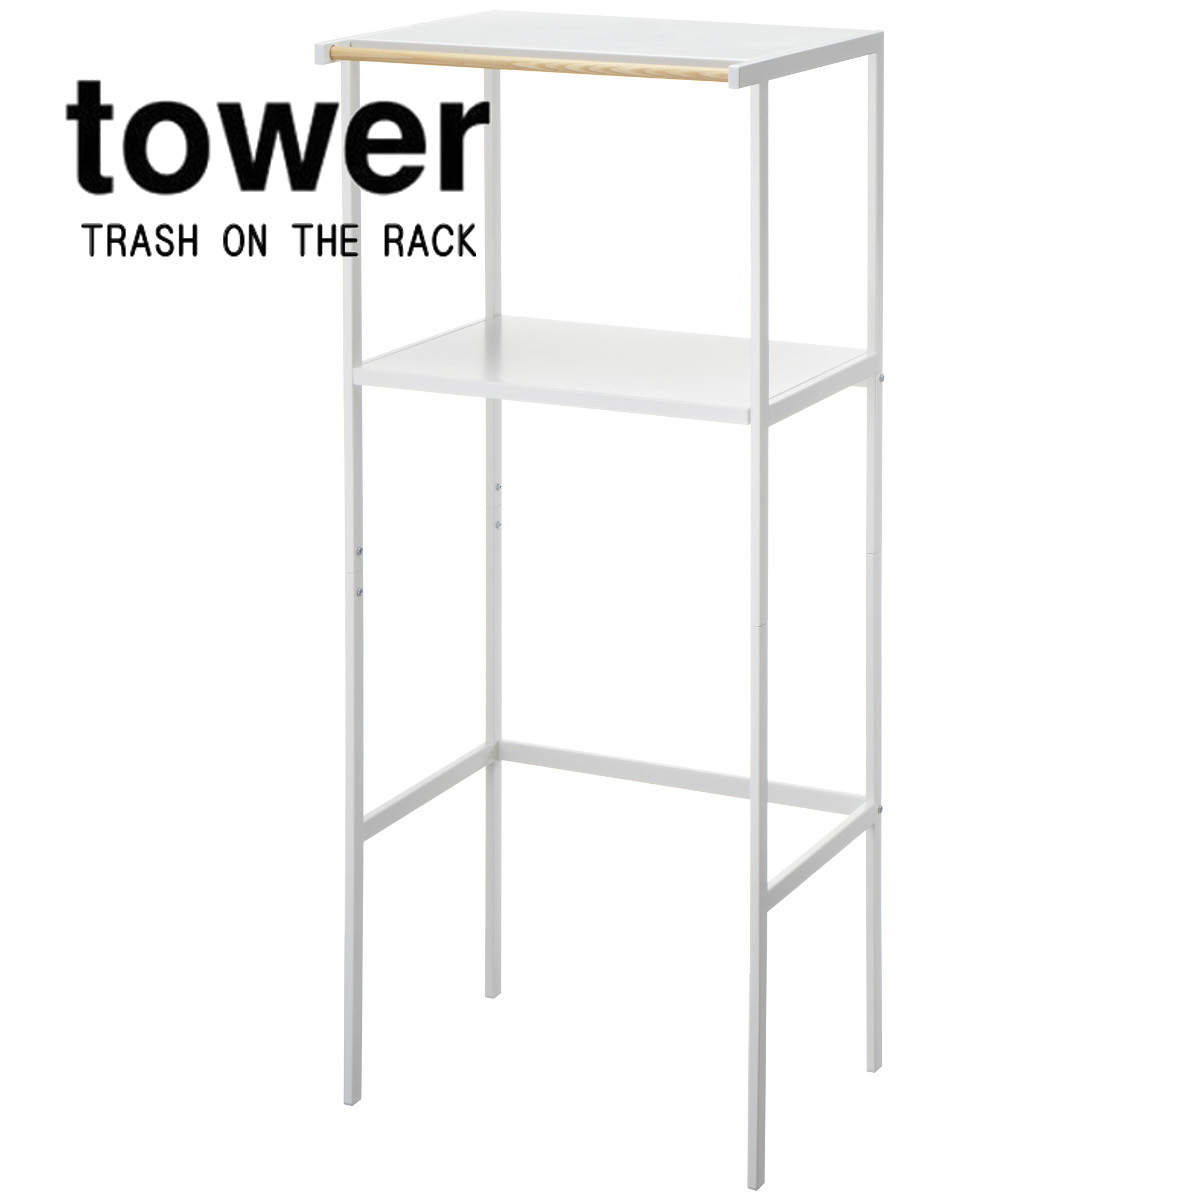 【tower】ゴミ箱上ラック タワー ホワイト ブラック